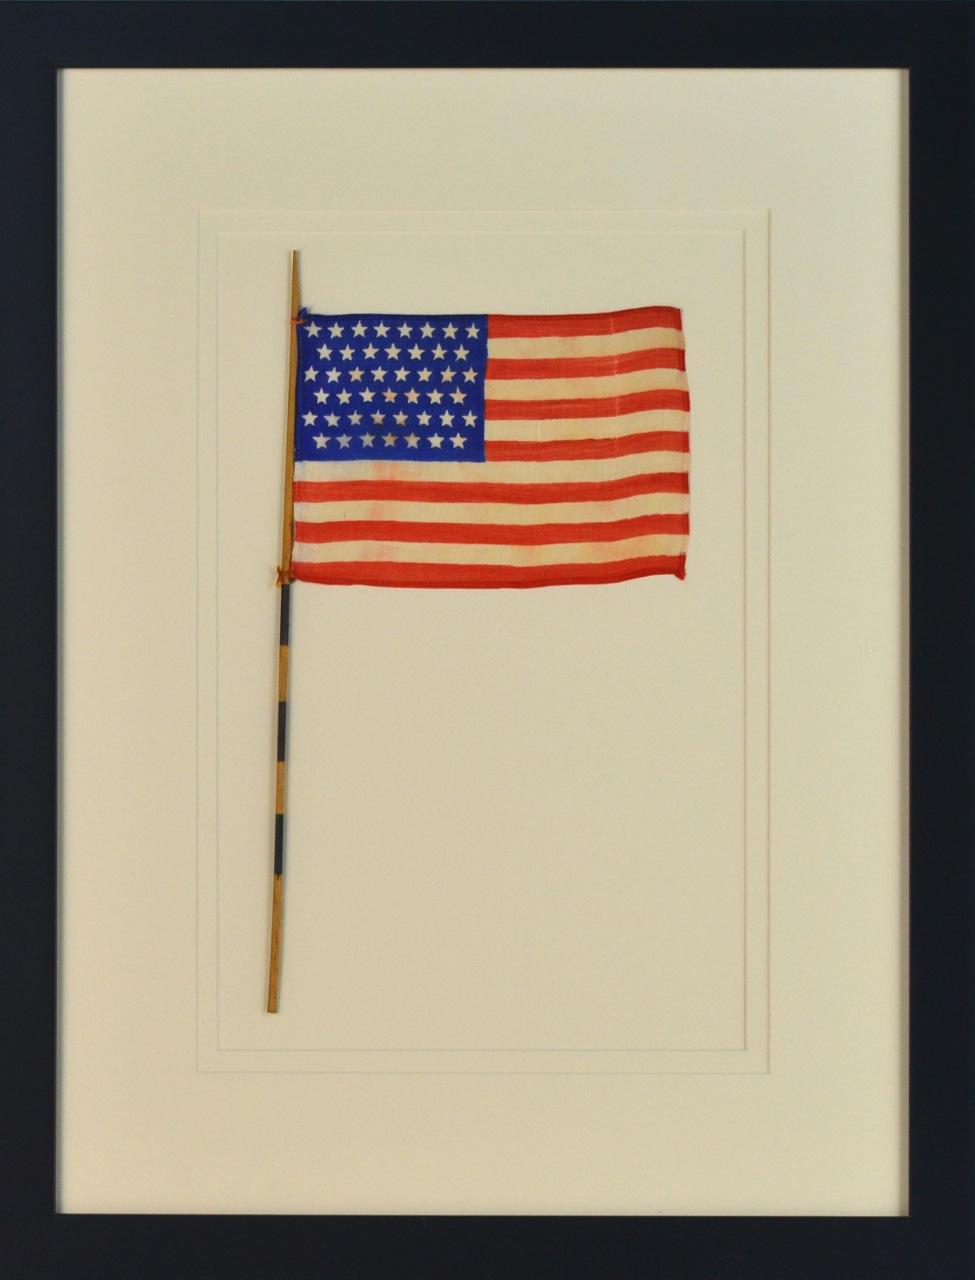 45 STAR FLAG ANTIQUE IMAGE